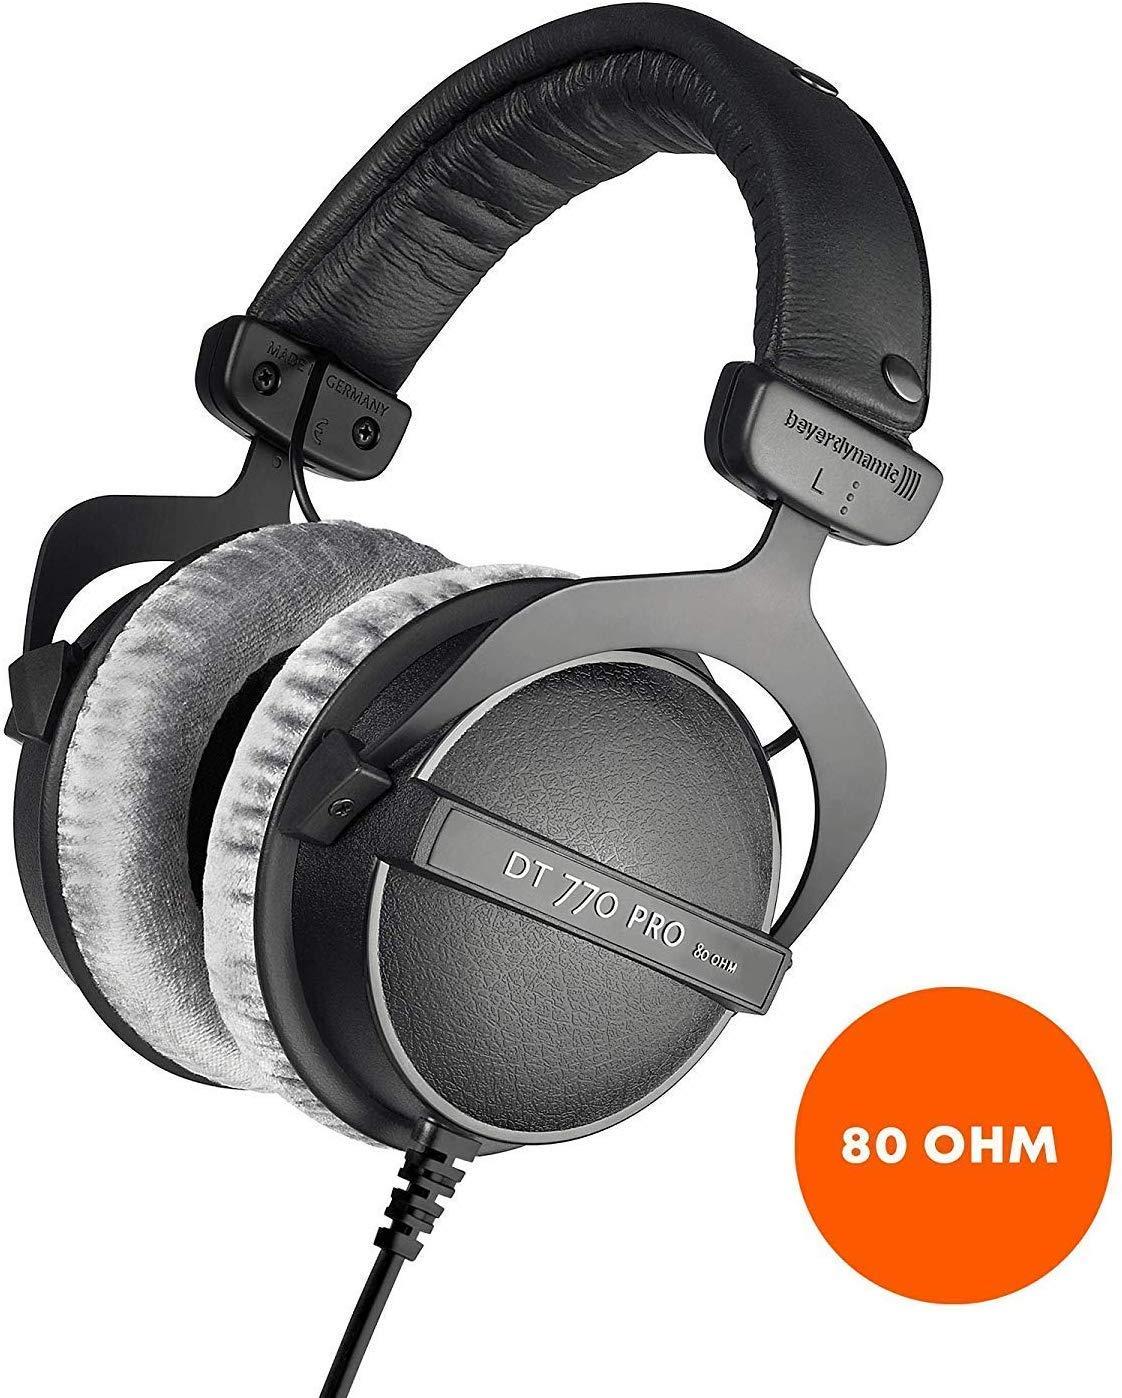 beyerdynamic DT 770 PRO Studio Headphones - 80 Ohm £91 delivered at Amazon